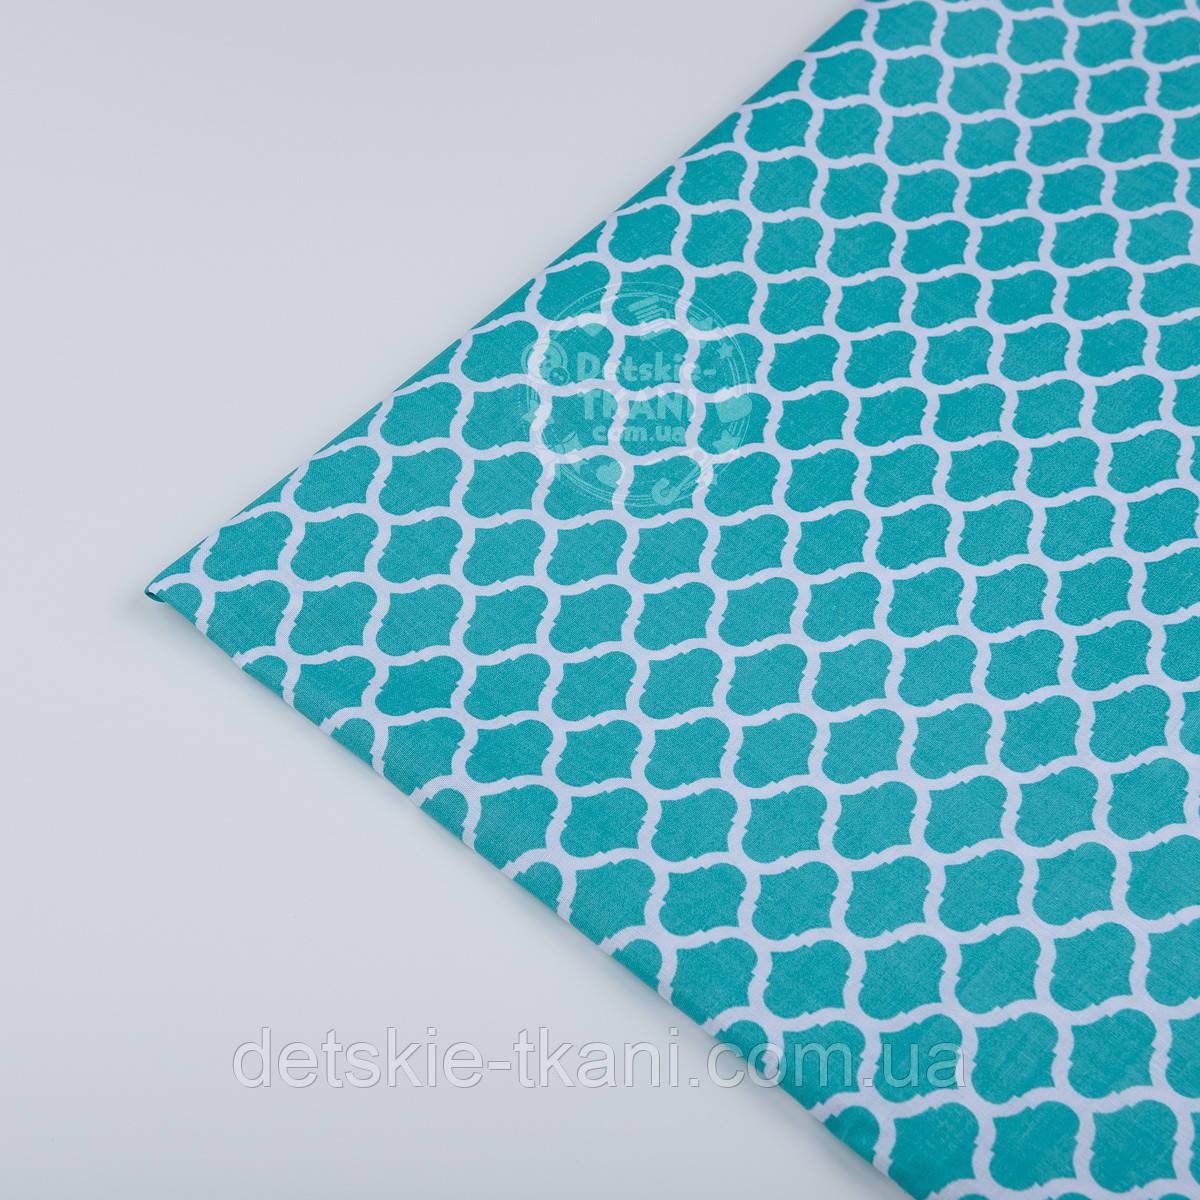 Отрез ткани №296а мини-марокко зелёно-бирюзового цвета, размером  50*160